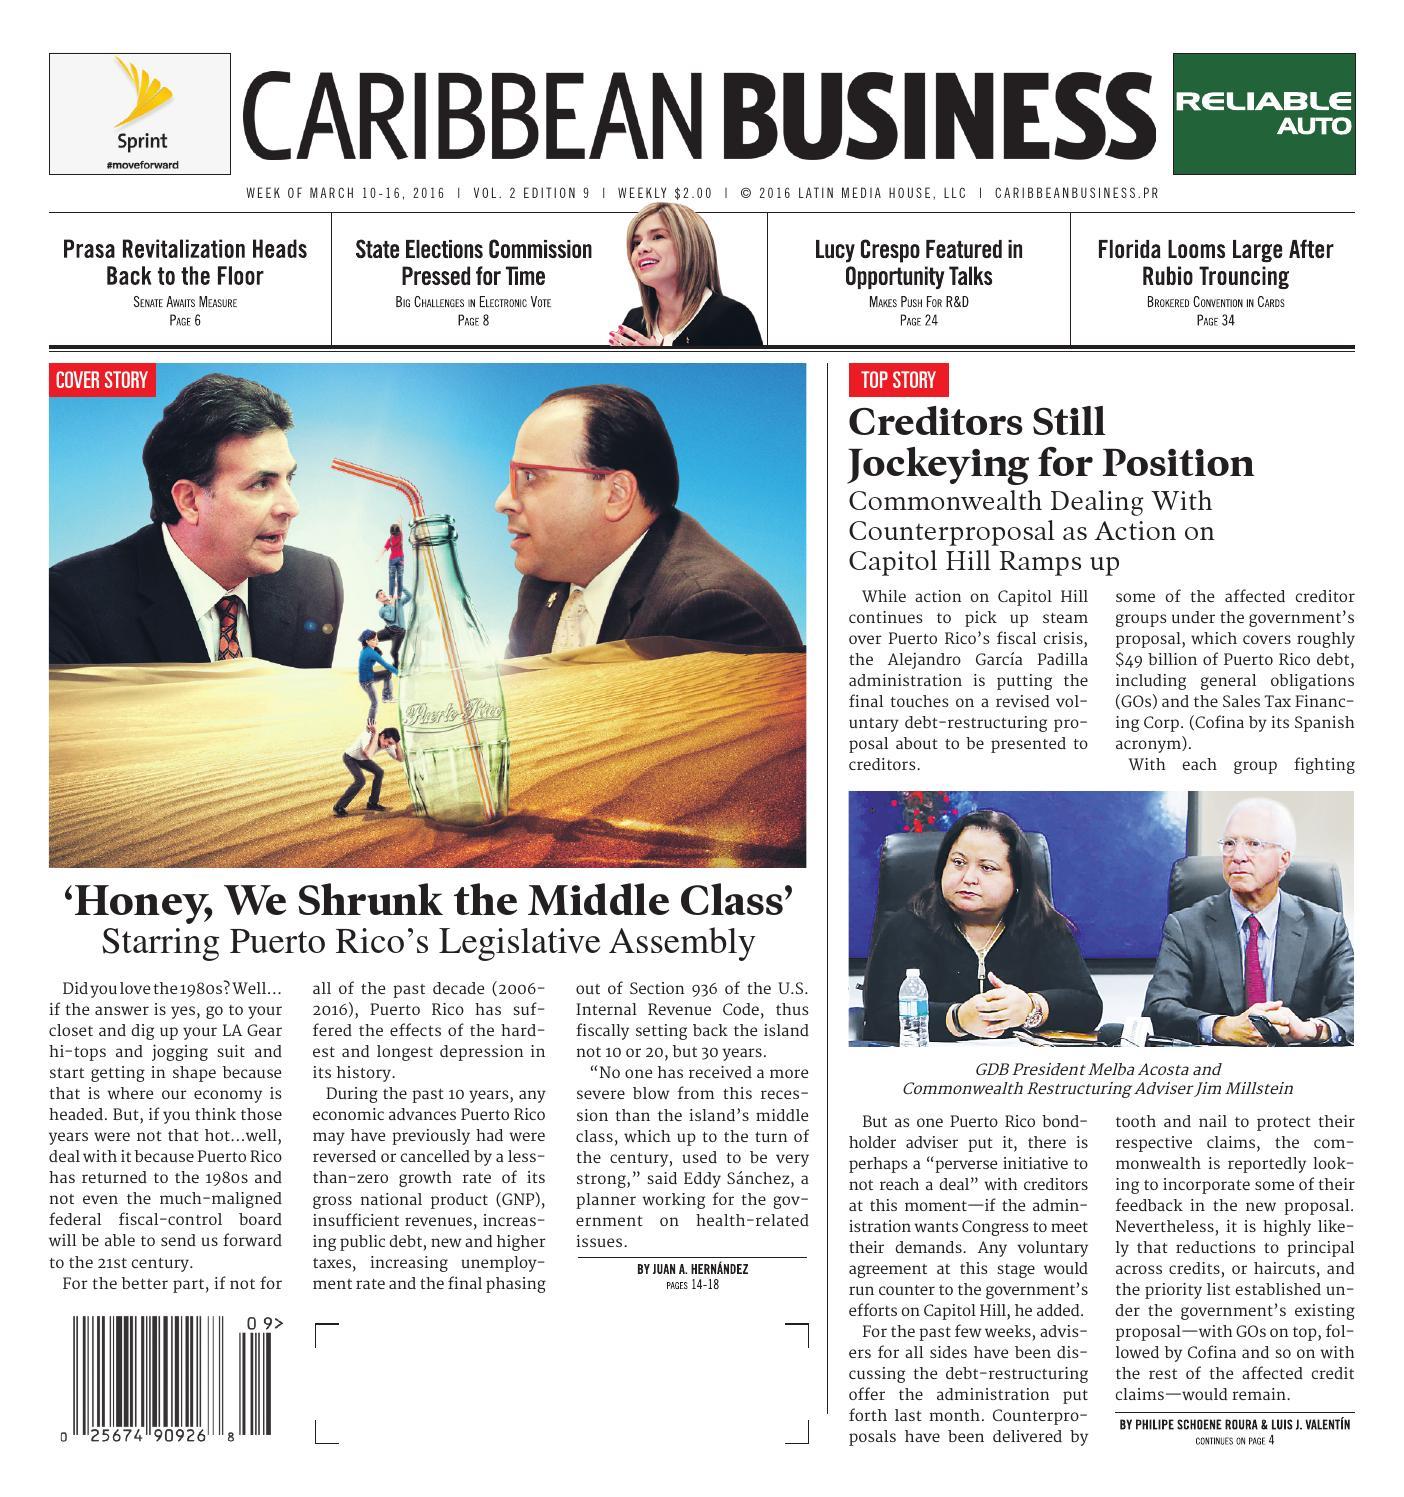 caribbean business march 10 2016 by latin media house llc issuu